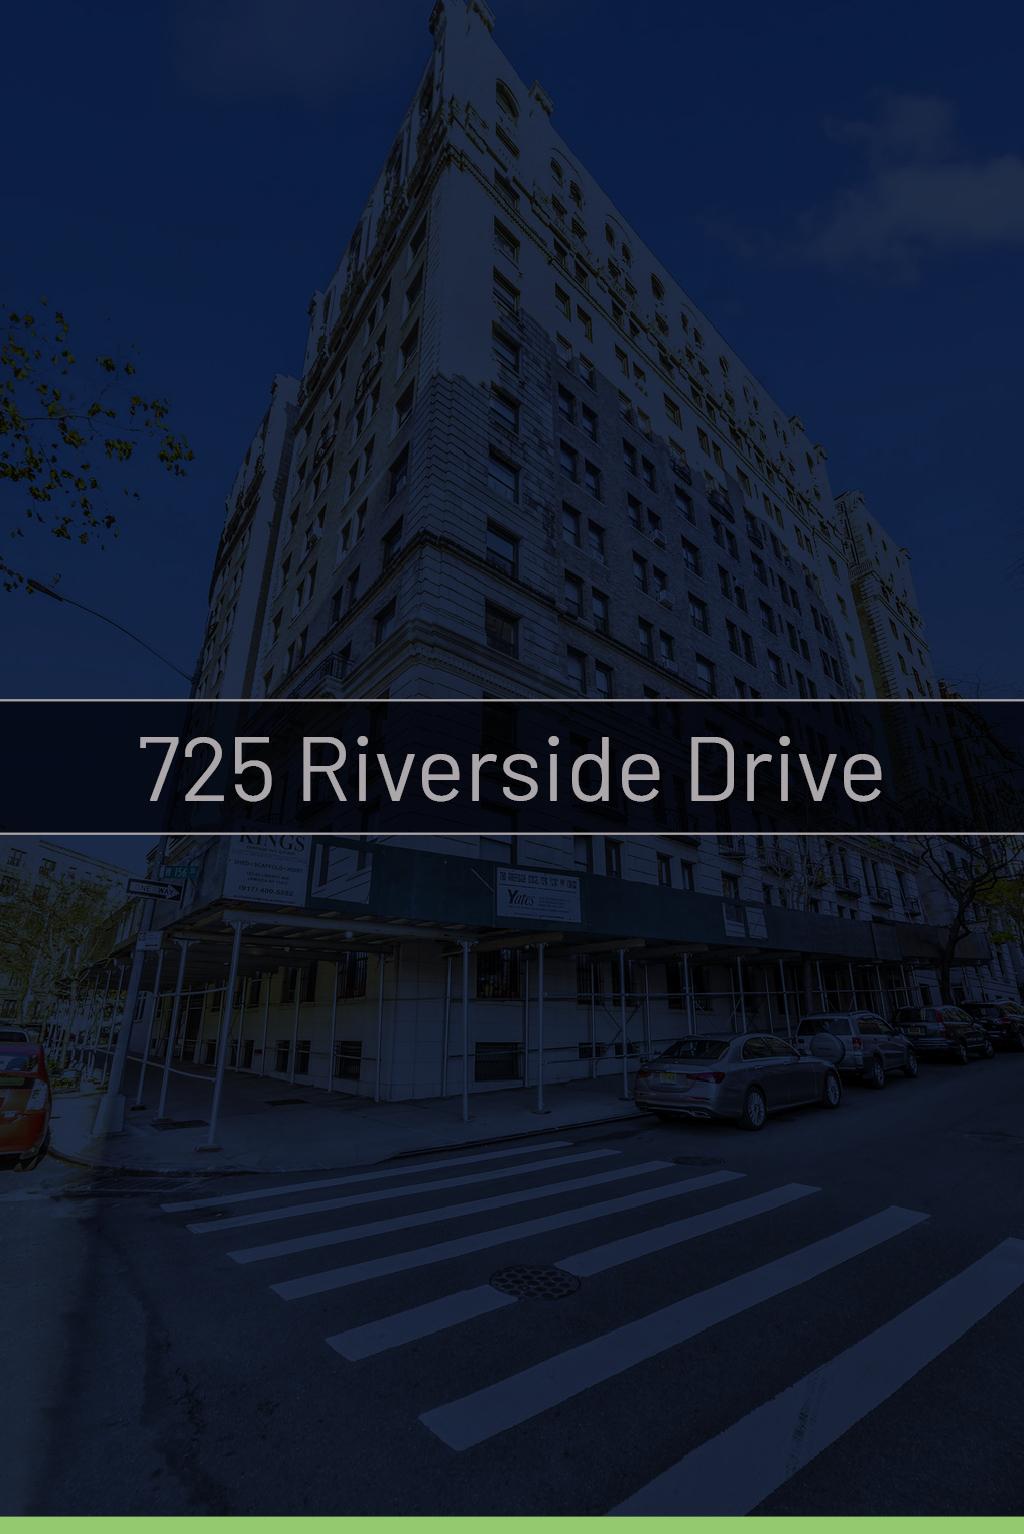 725RiversideDrive